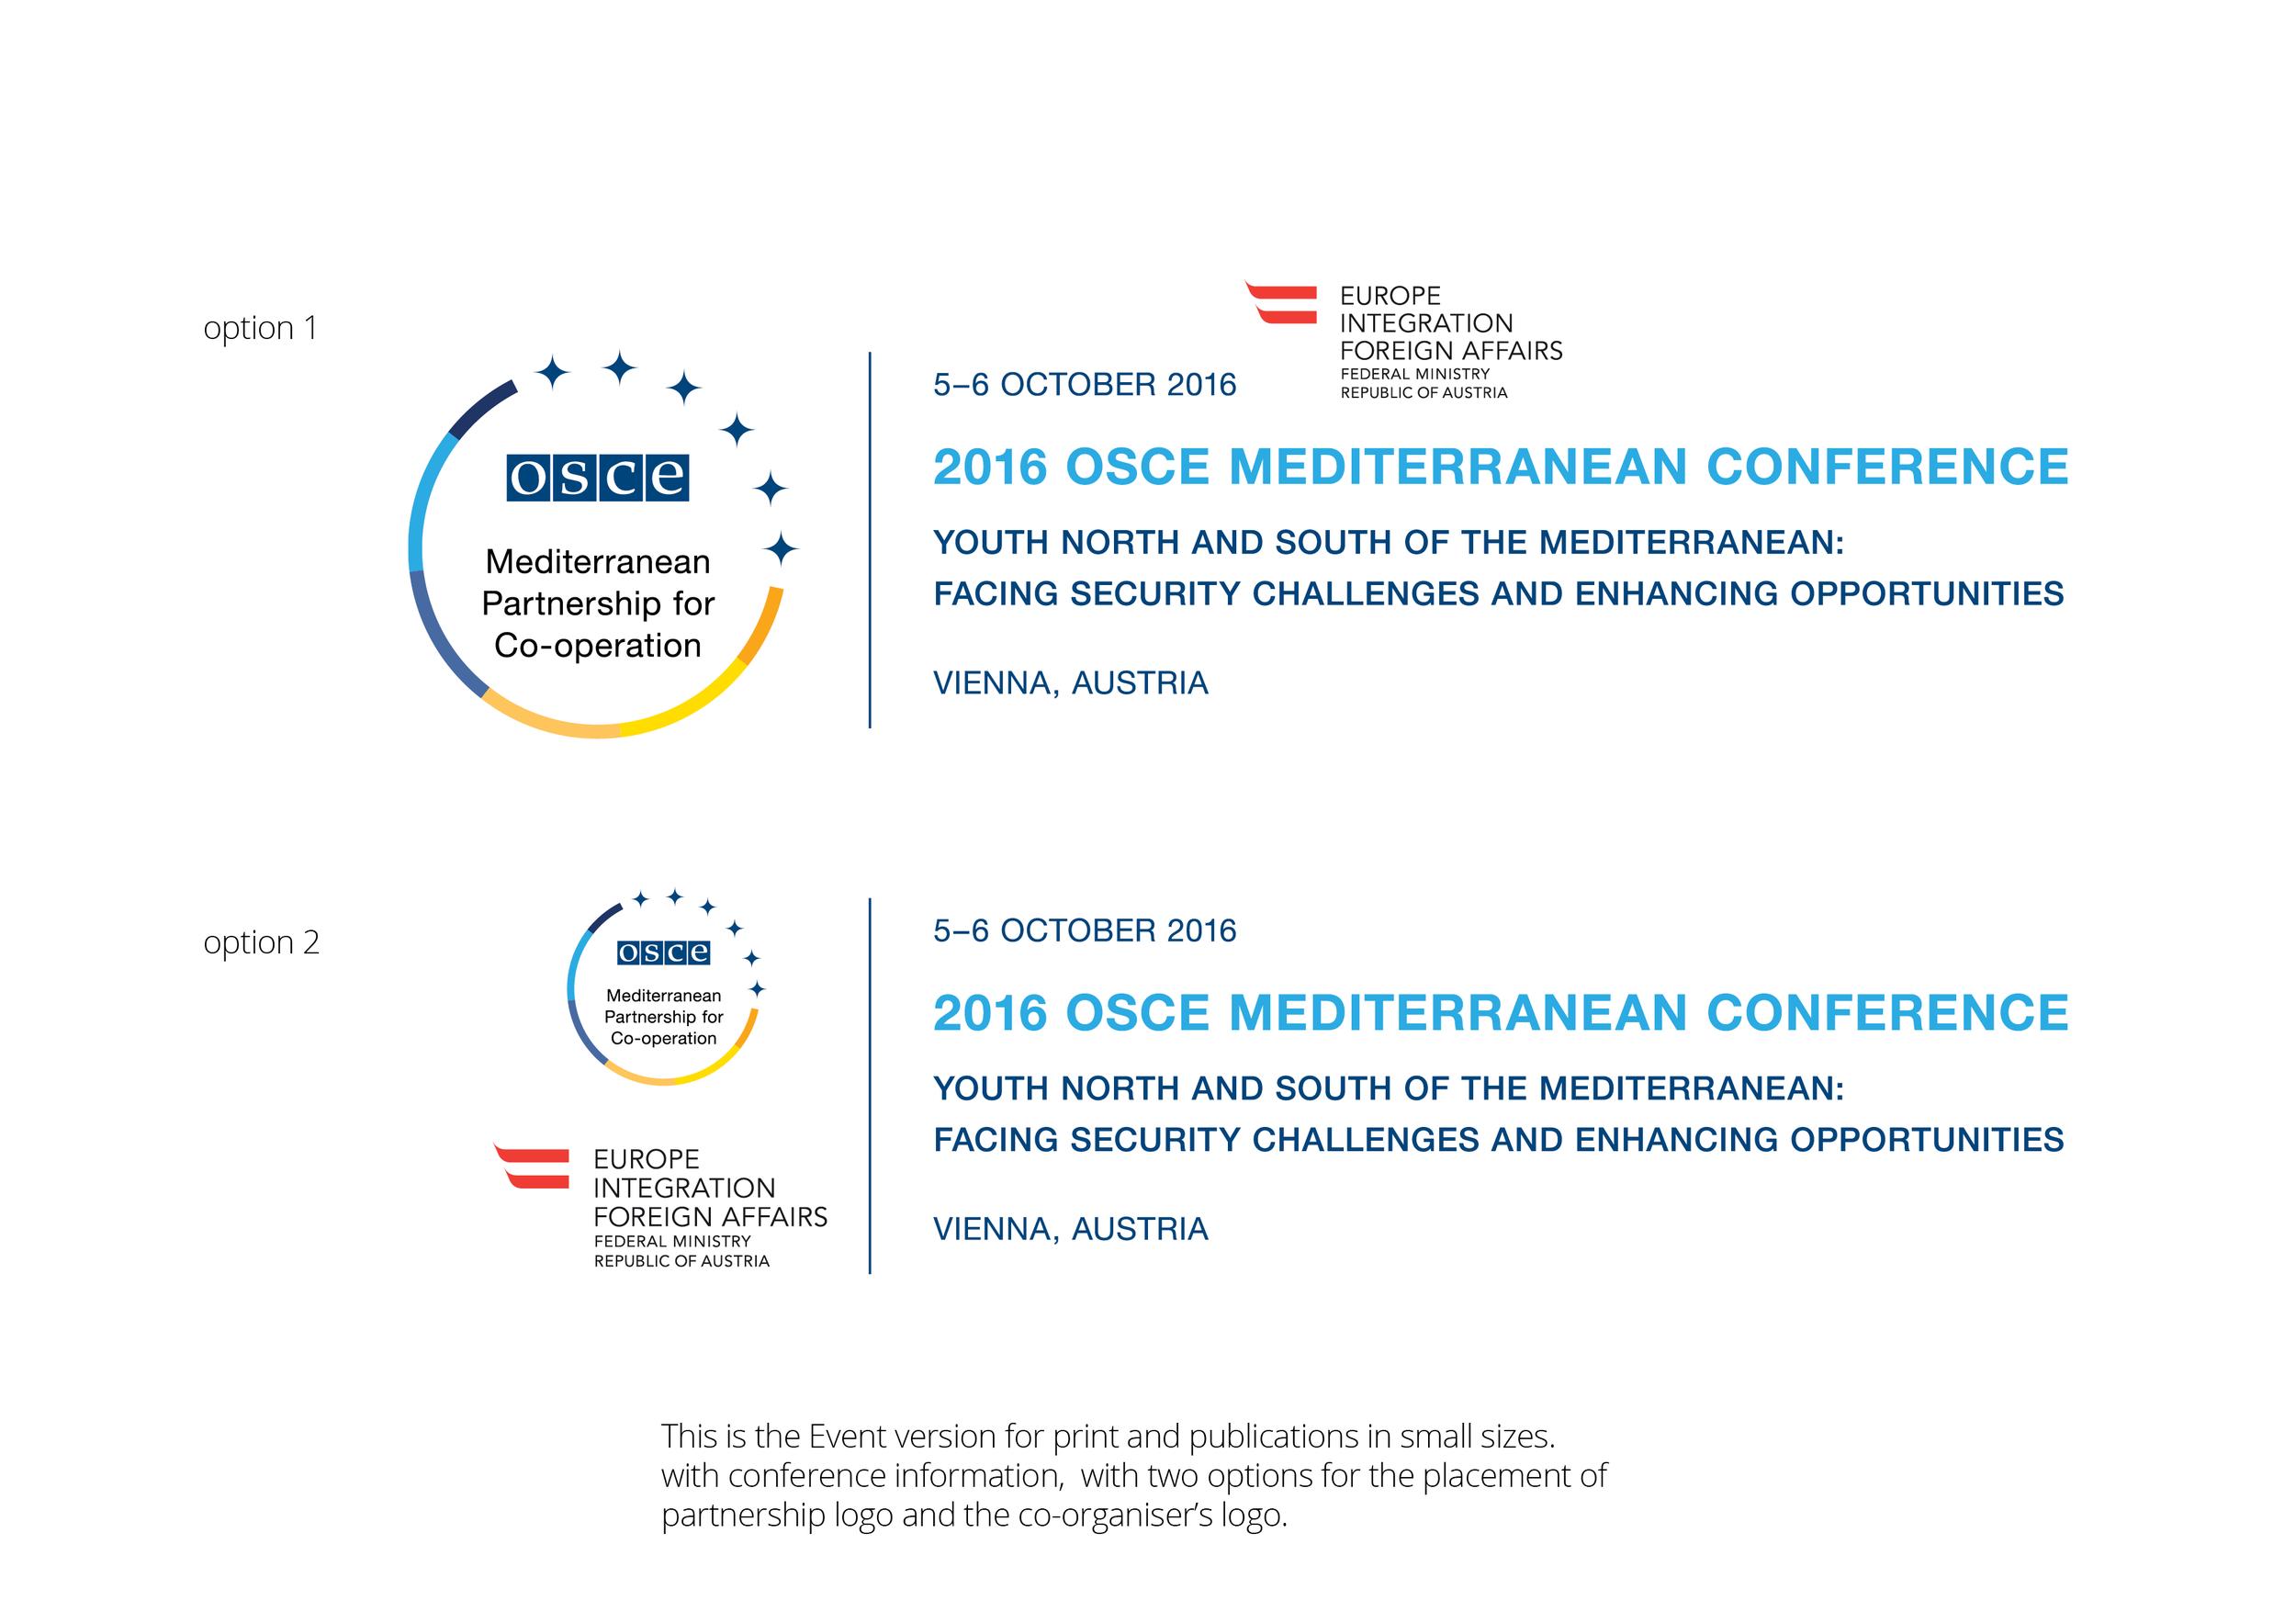 OSCE_Partnership_Logo_Graphic_Charter_31101615.png